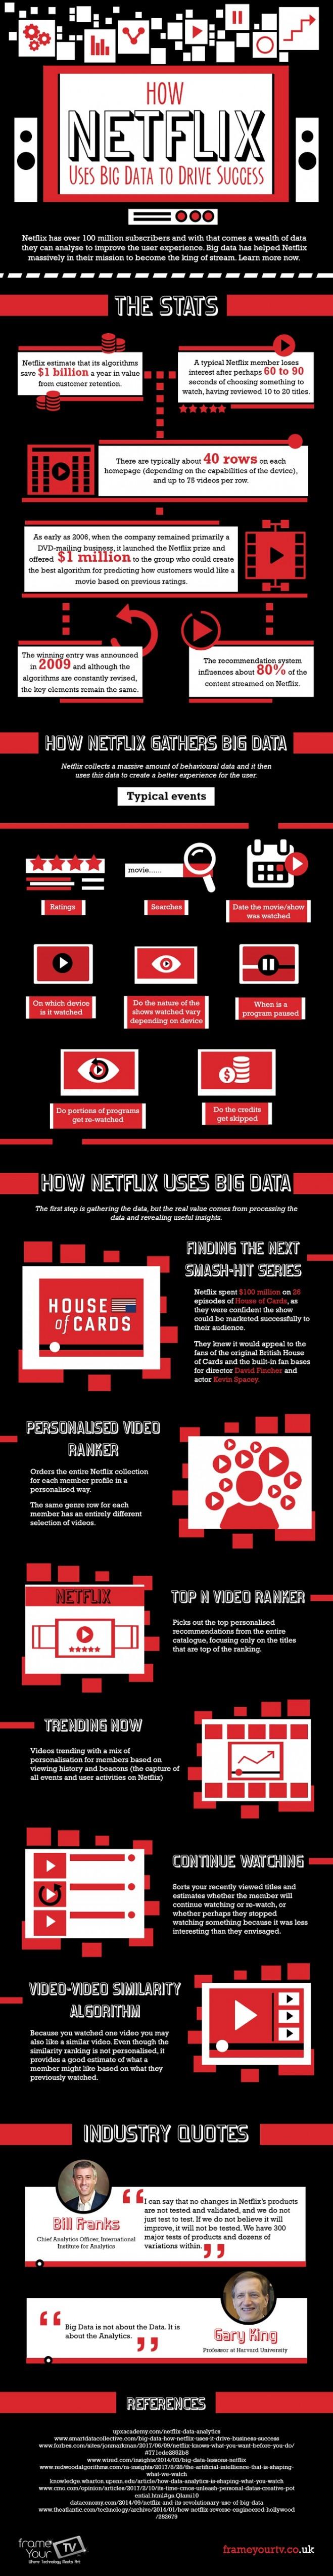 Inside Big Data Netflix Graph 1 - Predictive Analytics Times